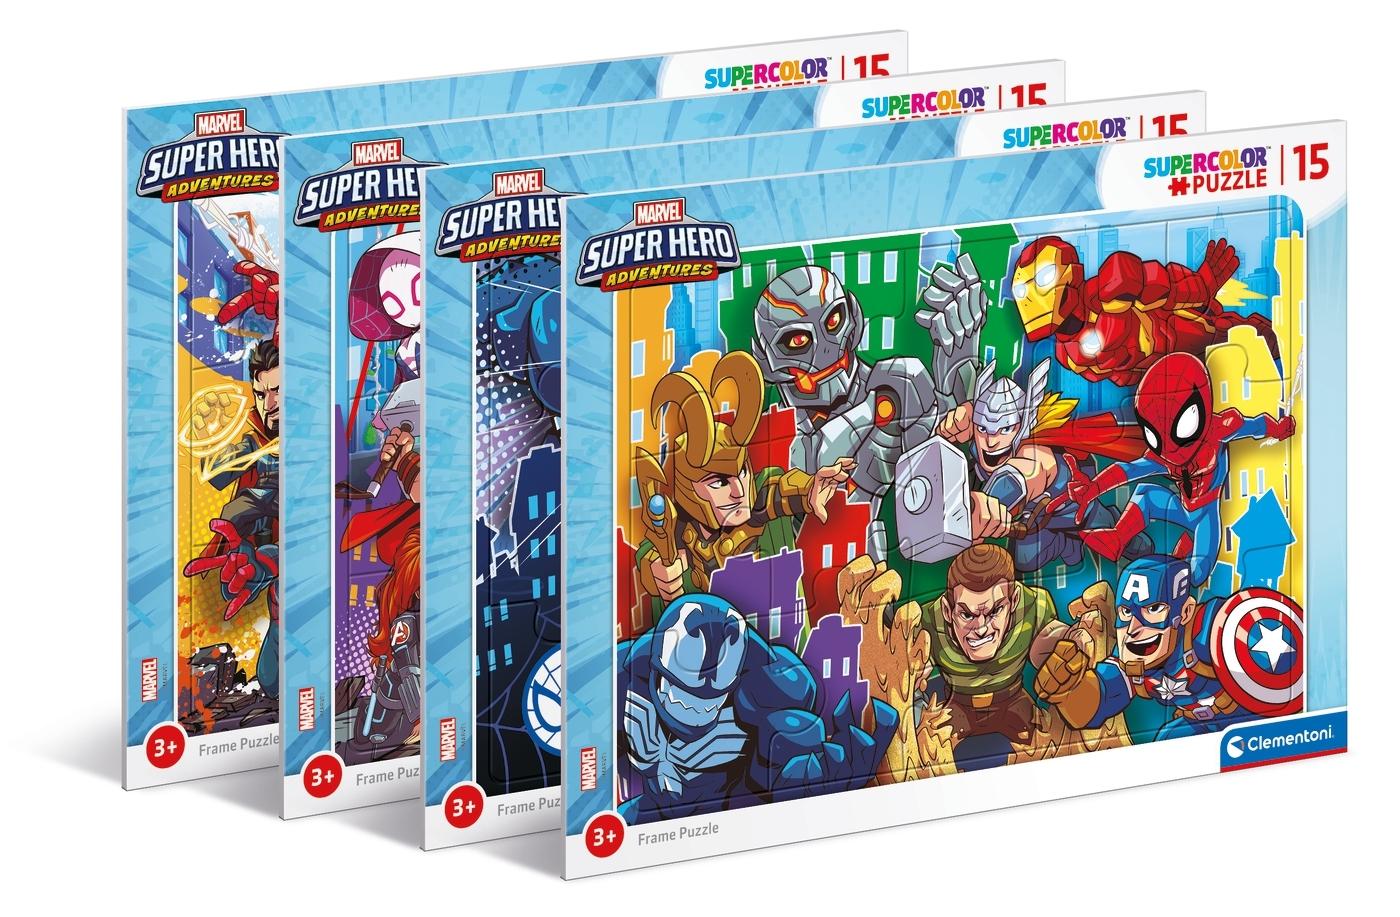 Puzzle ramkowe SuperColor 15: Superhero (22240)